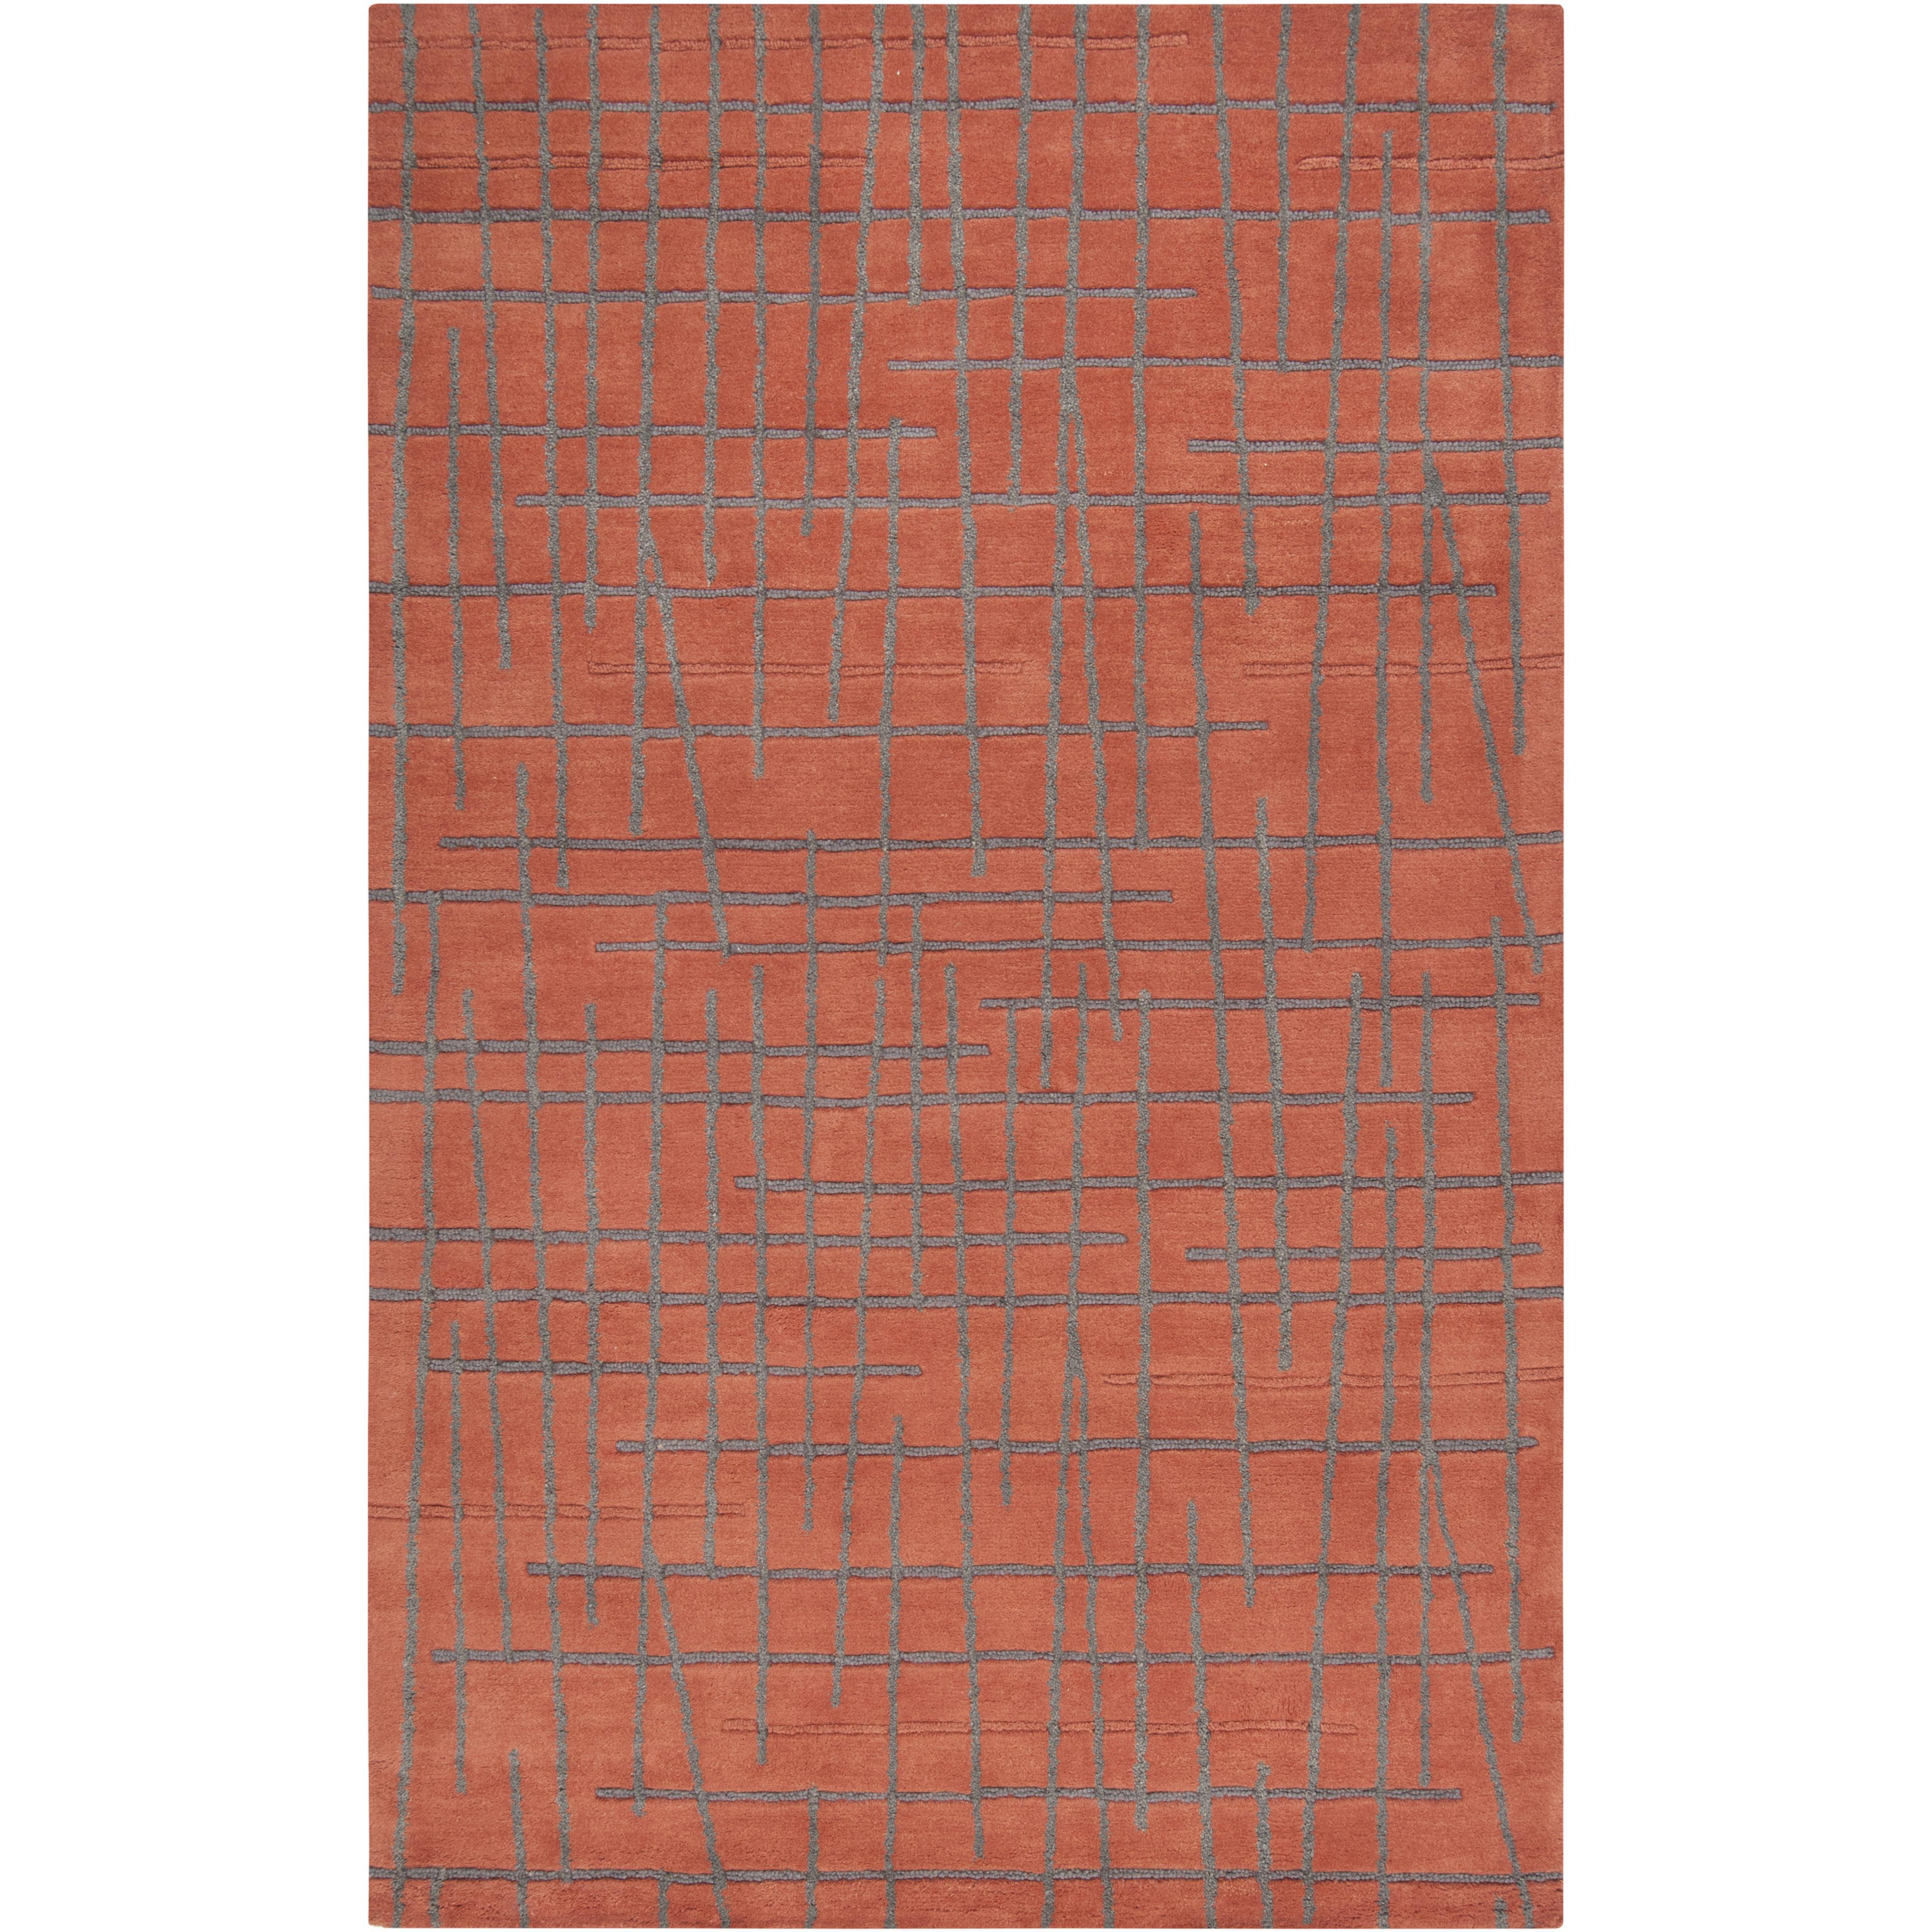 Surya Rugs Naya 5' x 8' - Item Number: NY5214-58